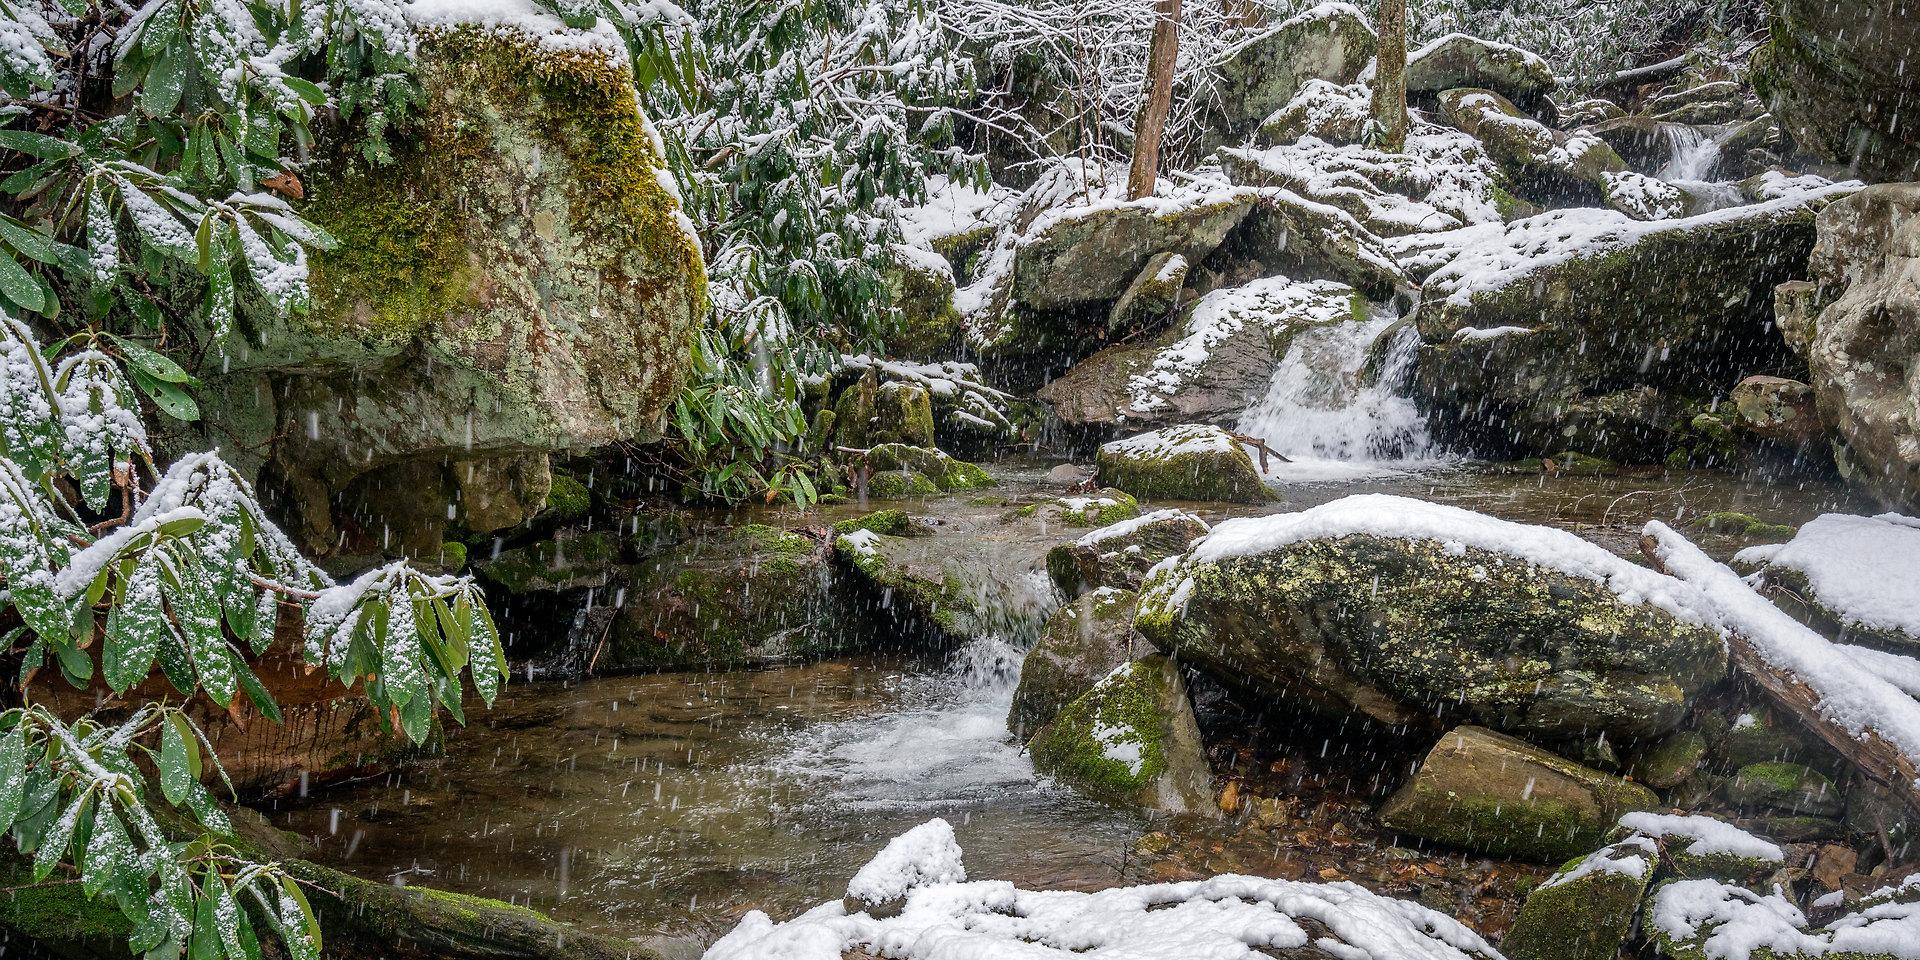 Otter Falls in Seven Devils, North Carolina